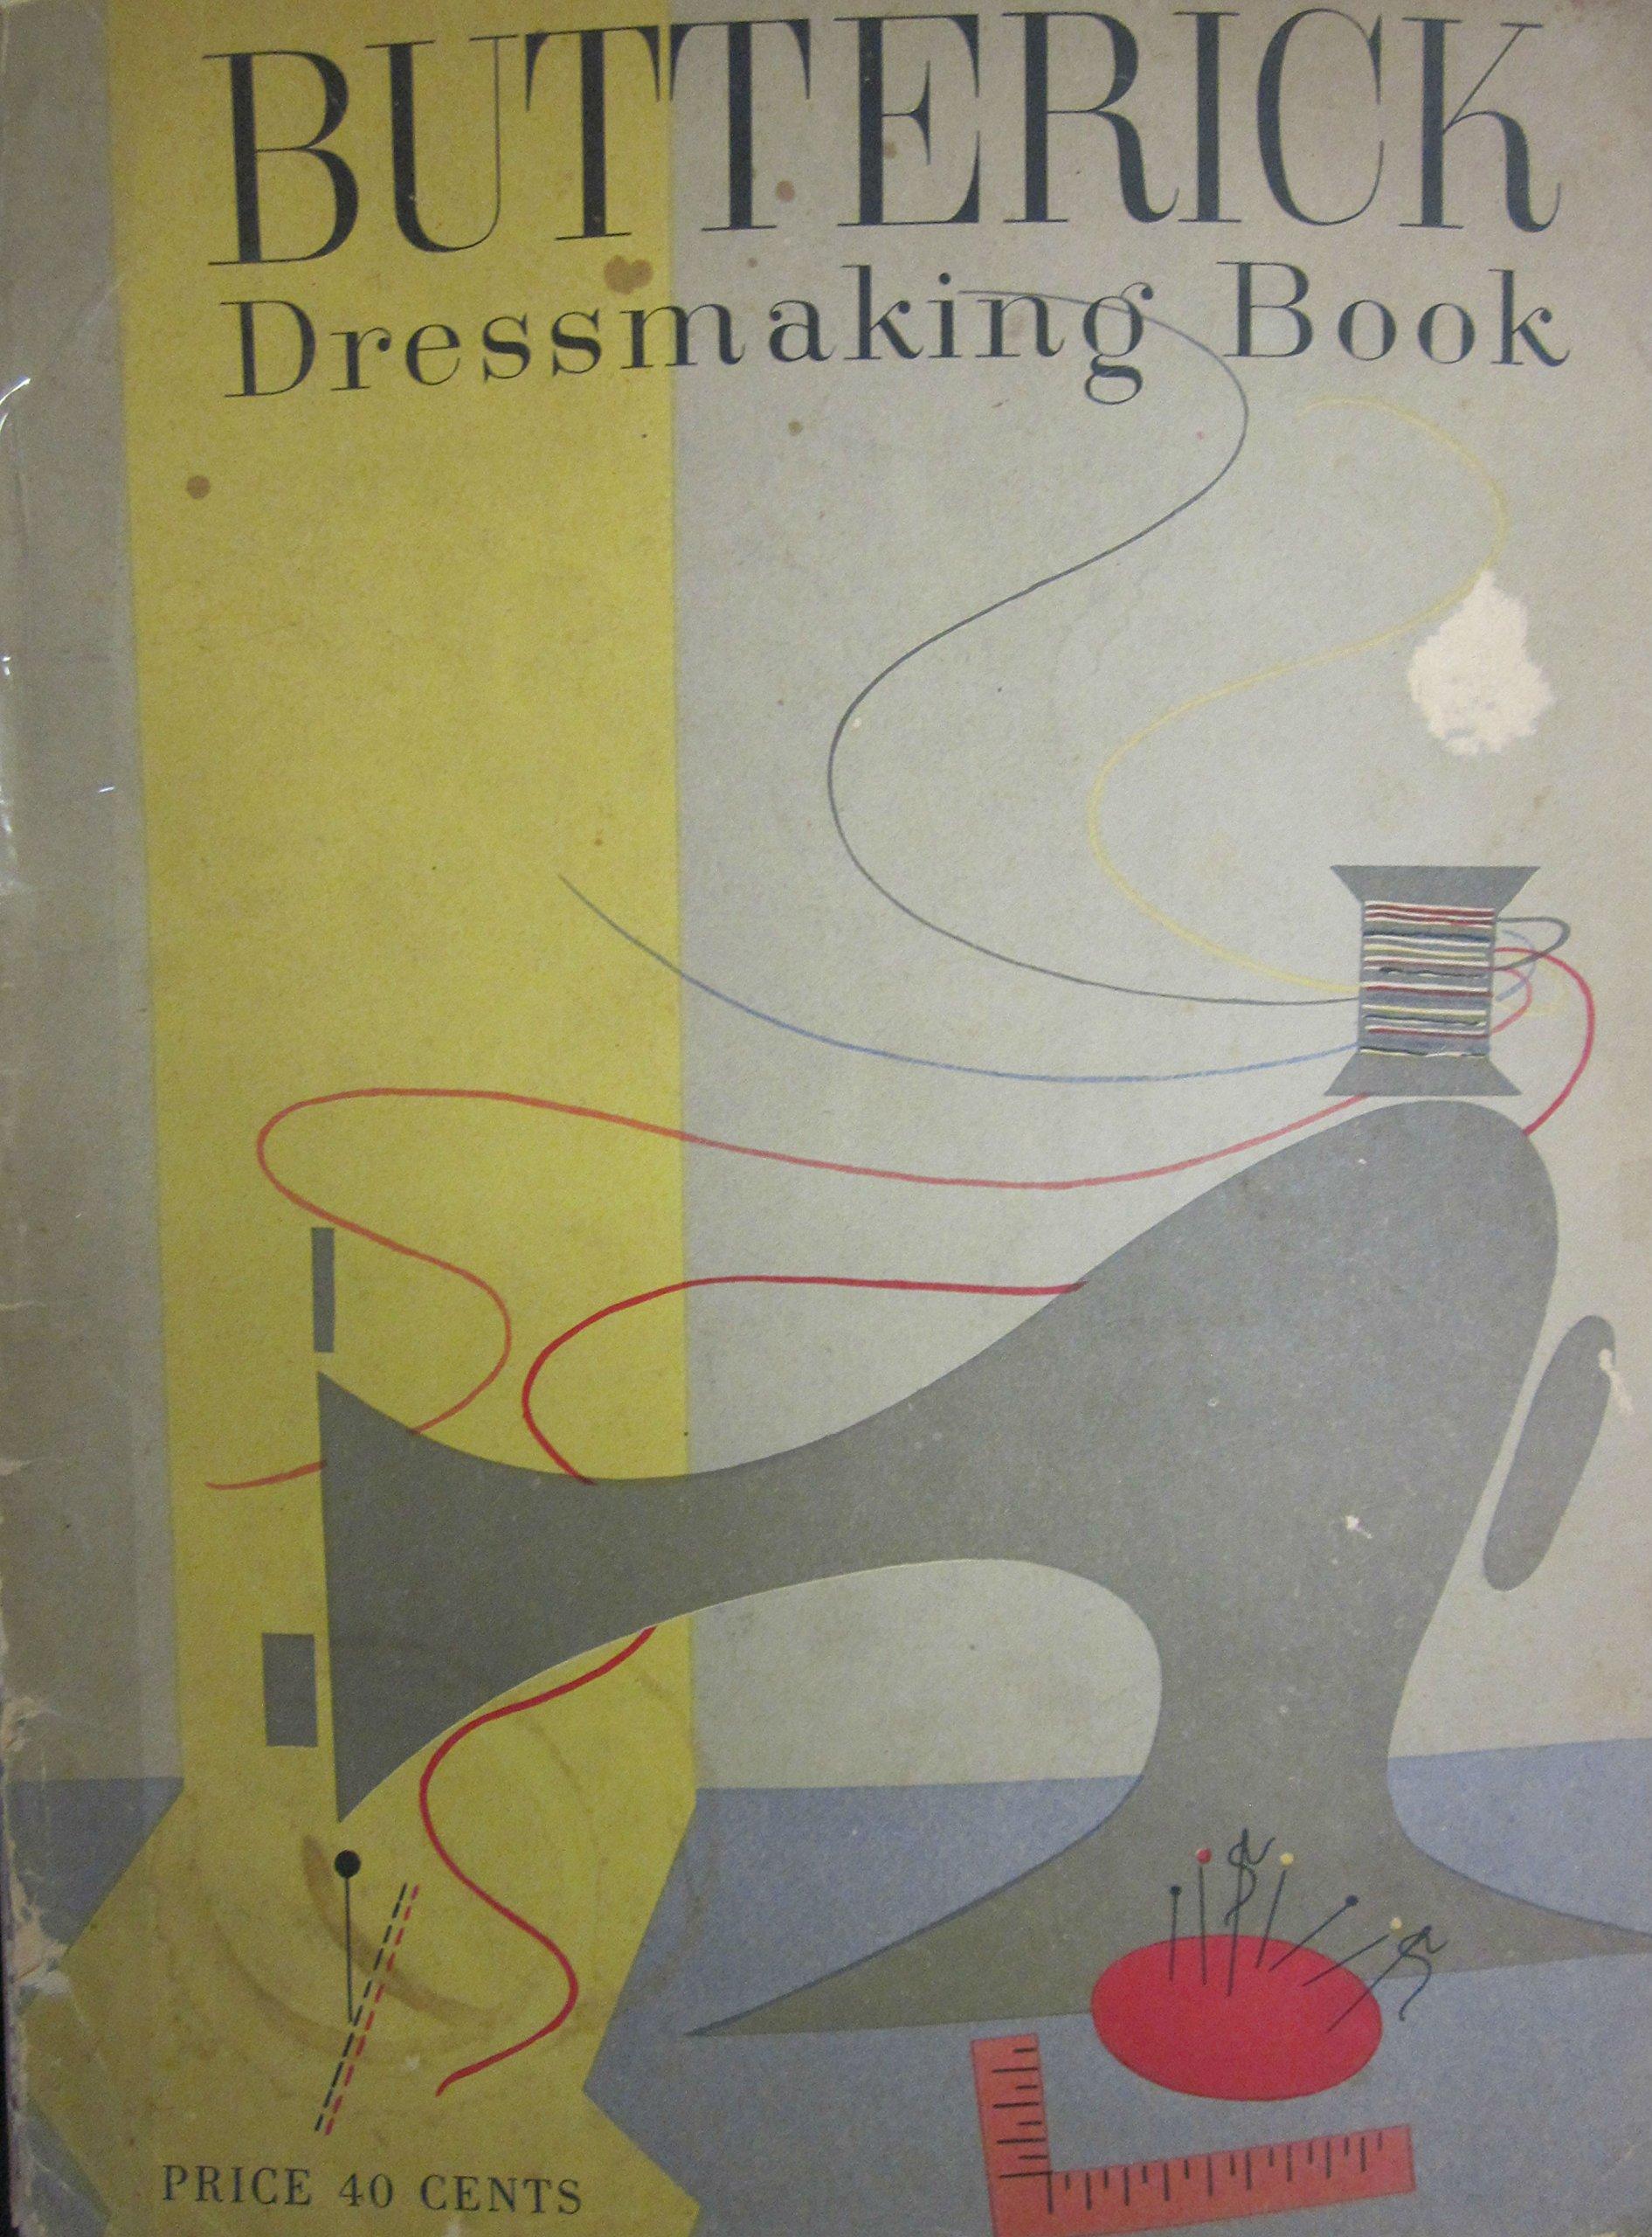 Butterick Dressmaking Patterns – Design Patterns